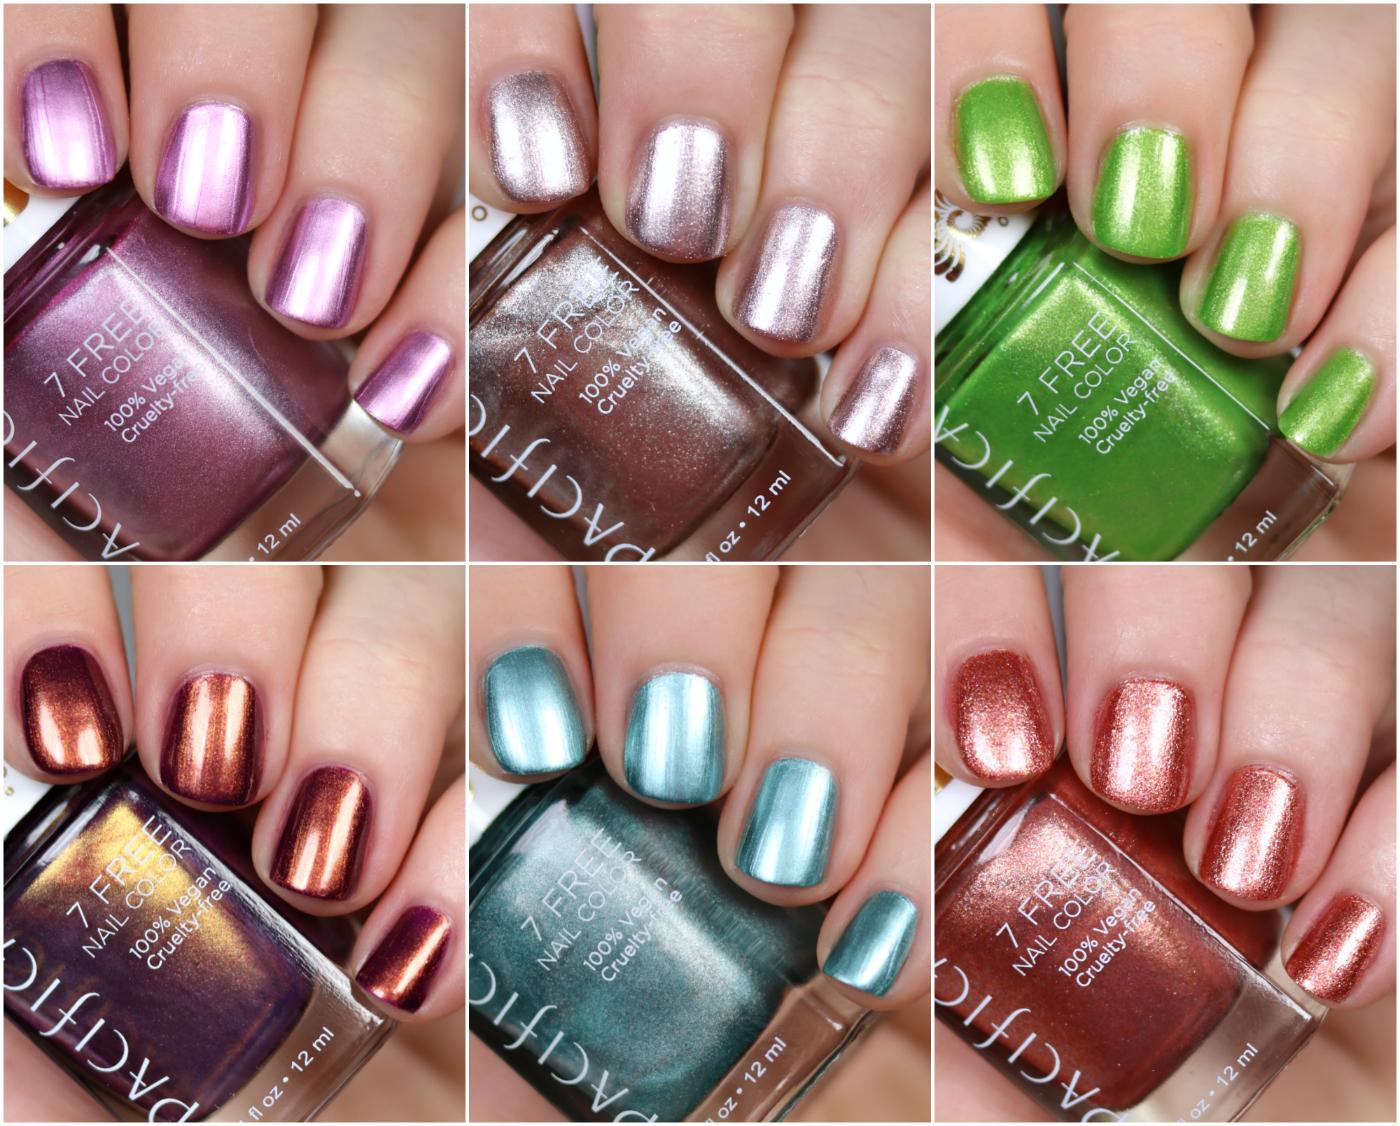 New Pacifica Metallic Nail Polish! - The Feminine Files